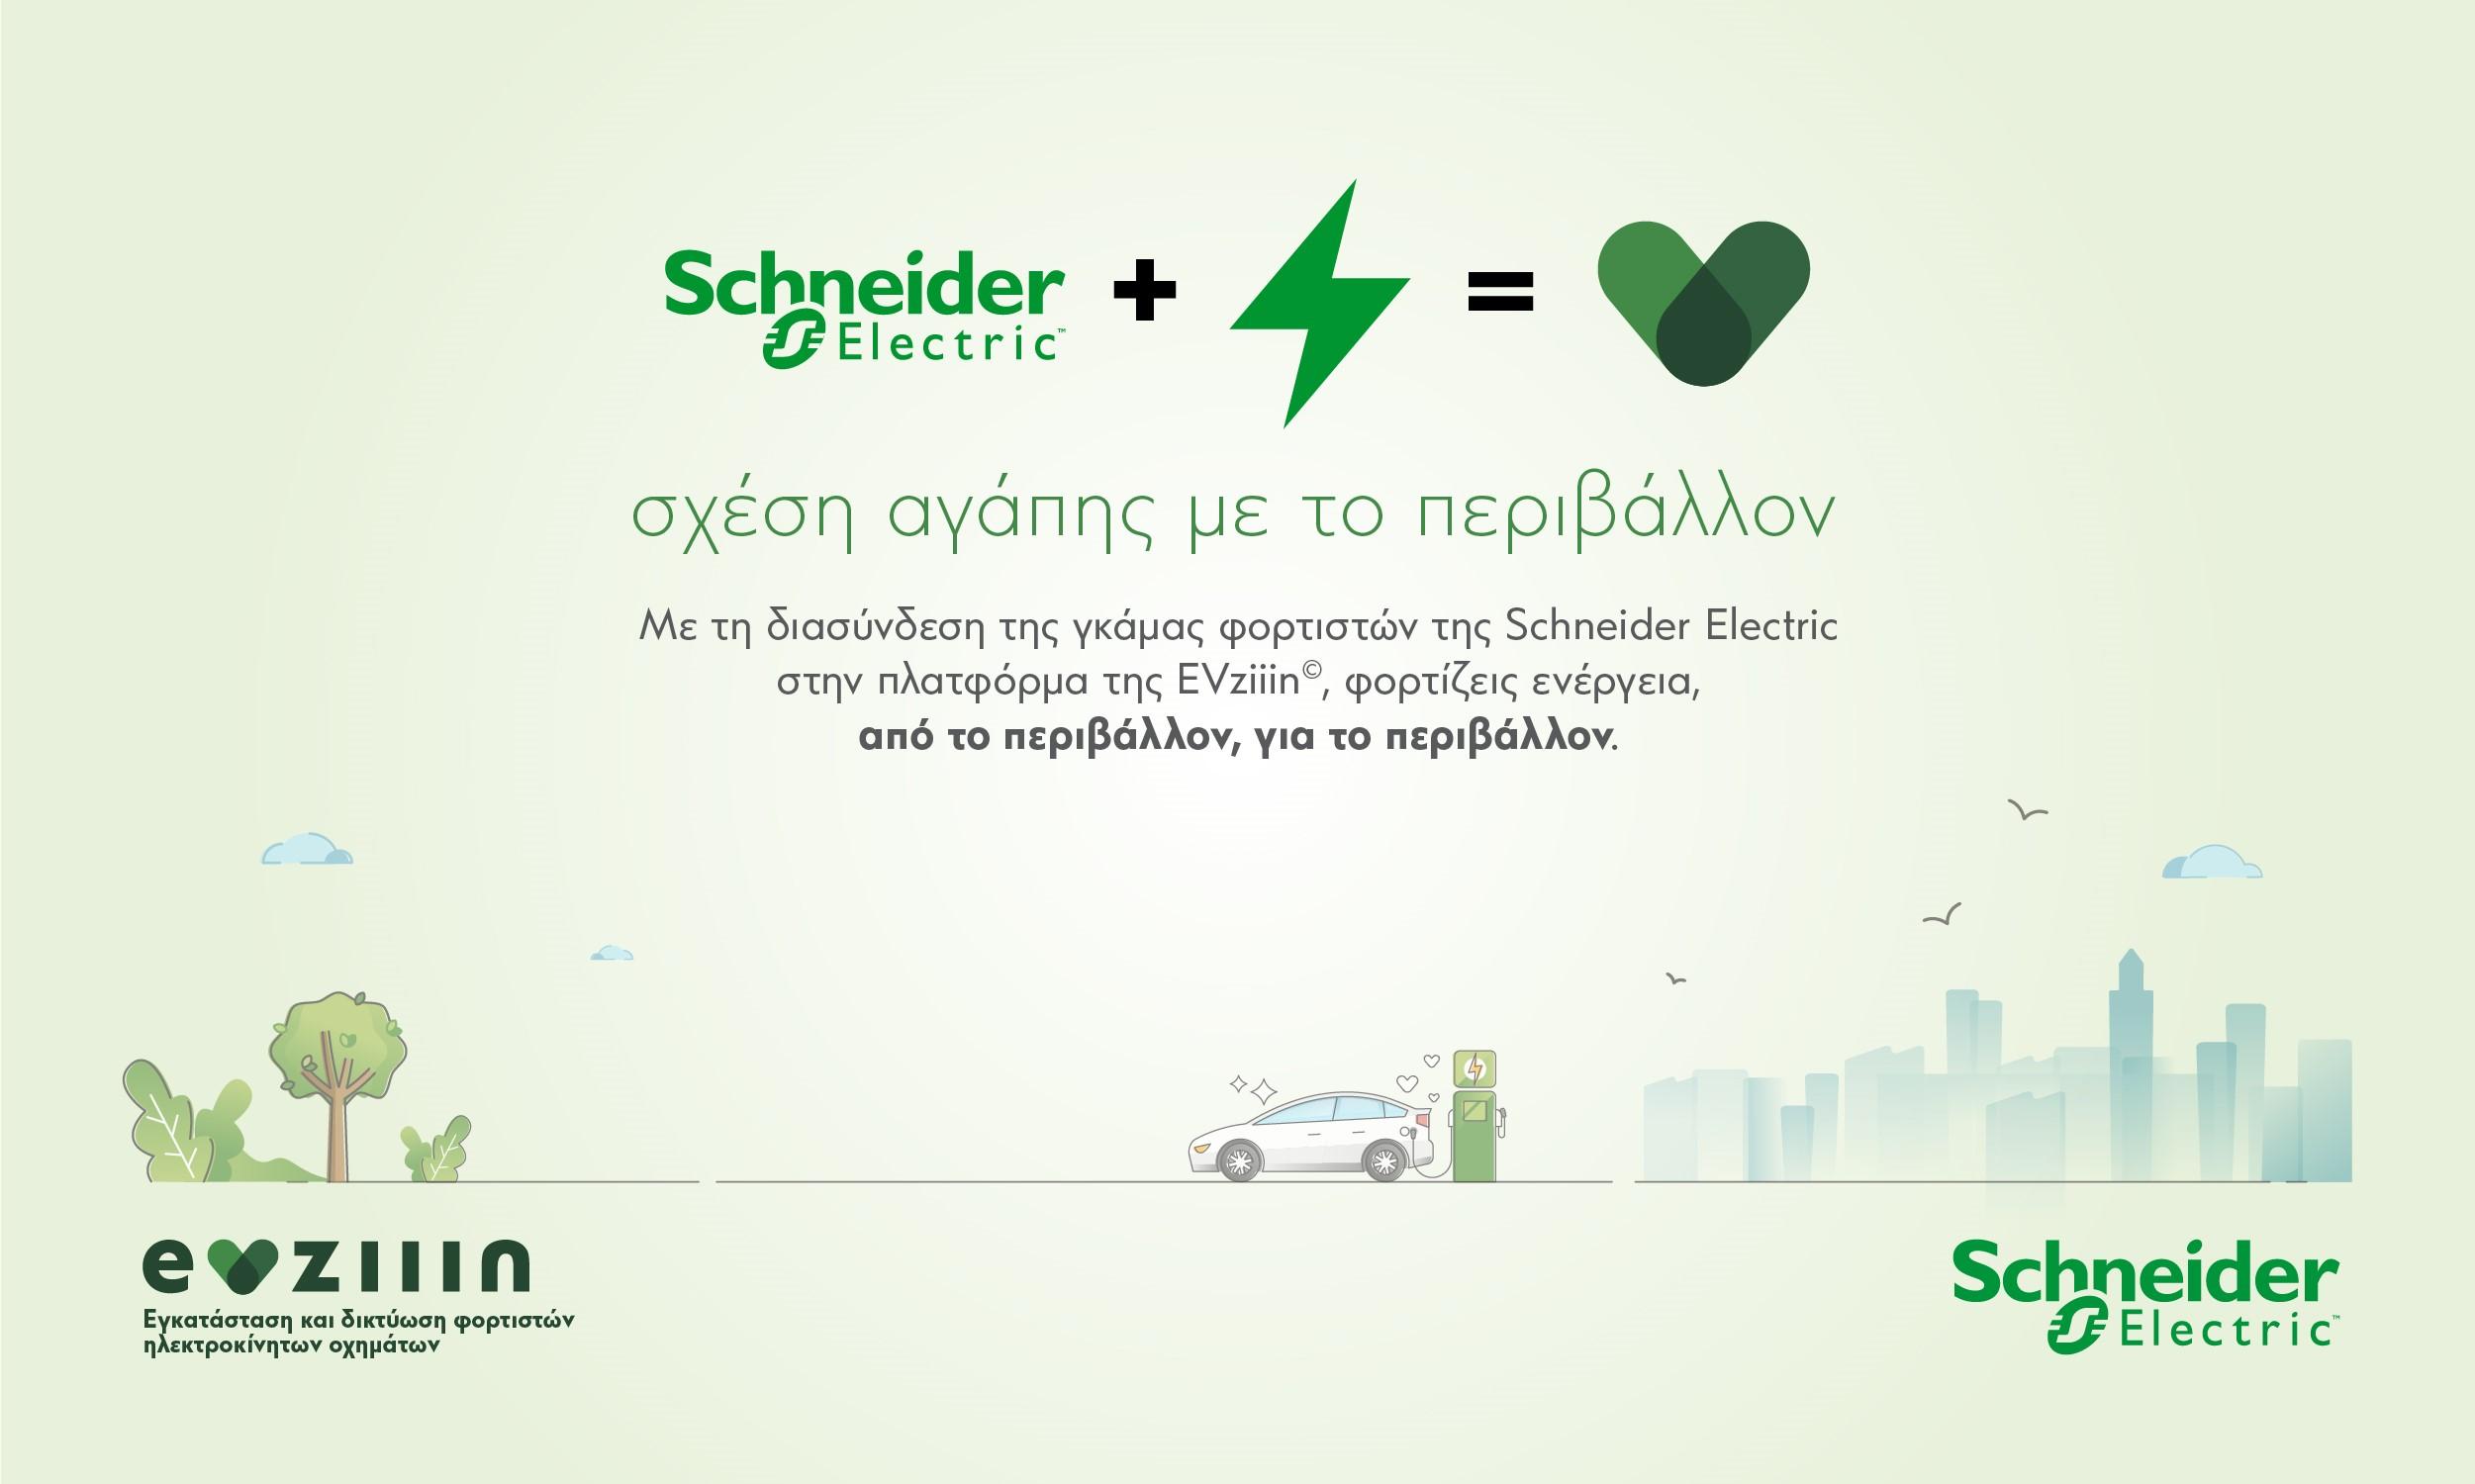 EVziiin© και Schneider Electric: Σχέση αγάπης με το περιβάλλον